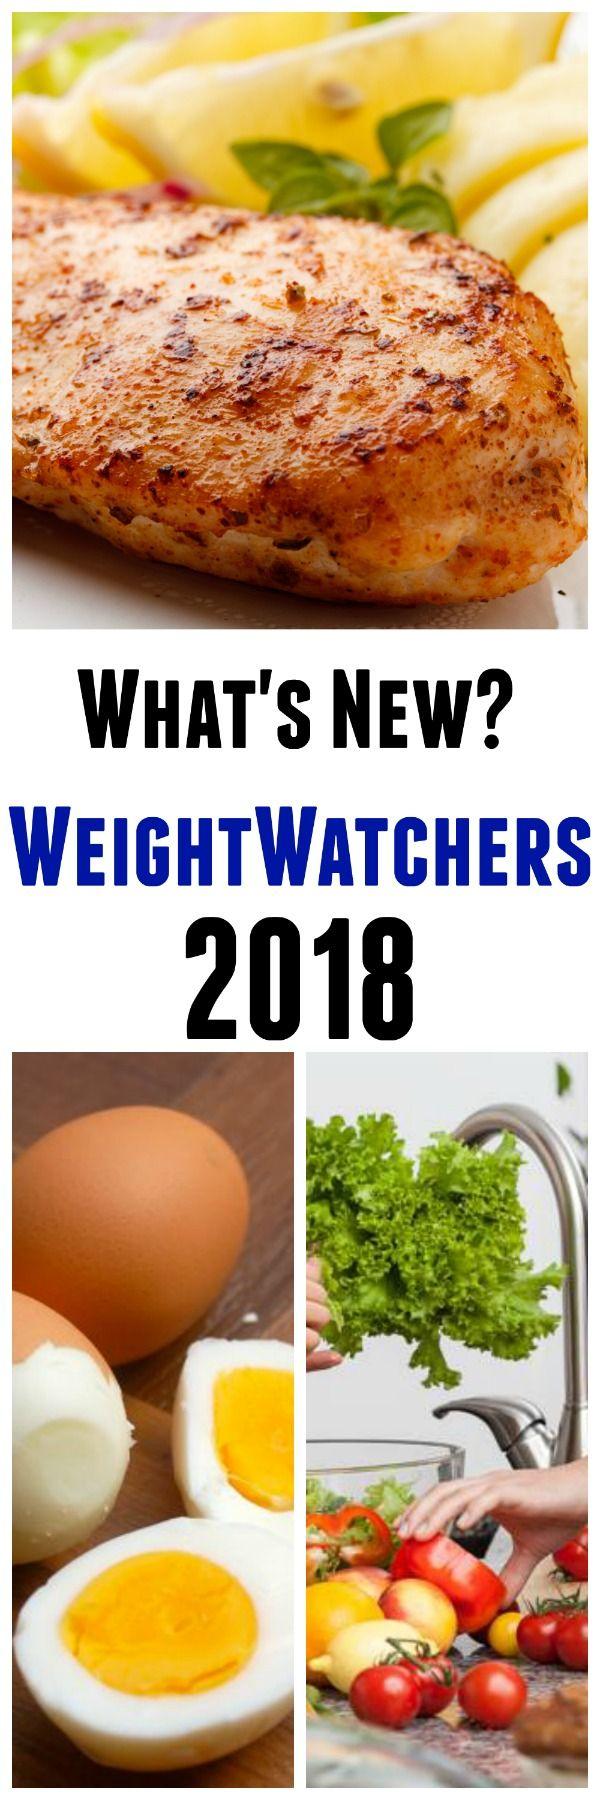 New Weight Watchers Program